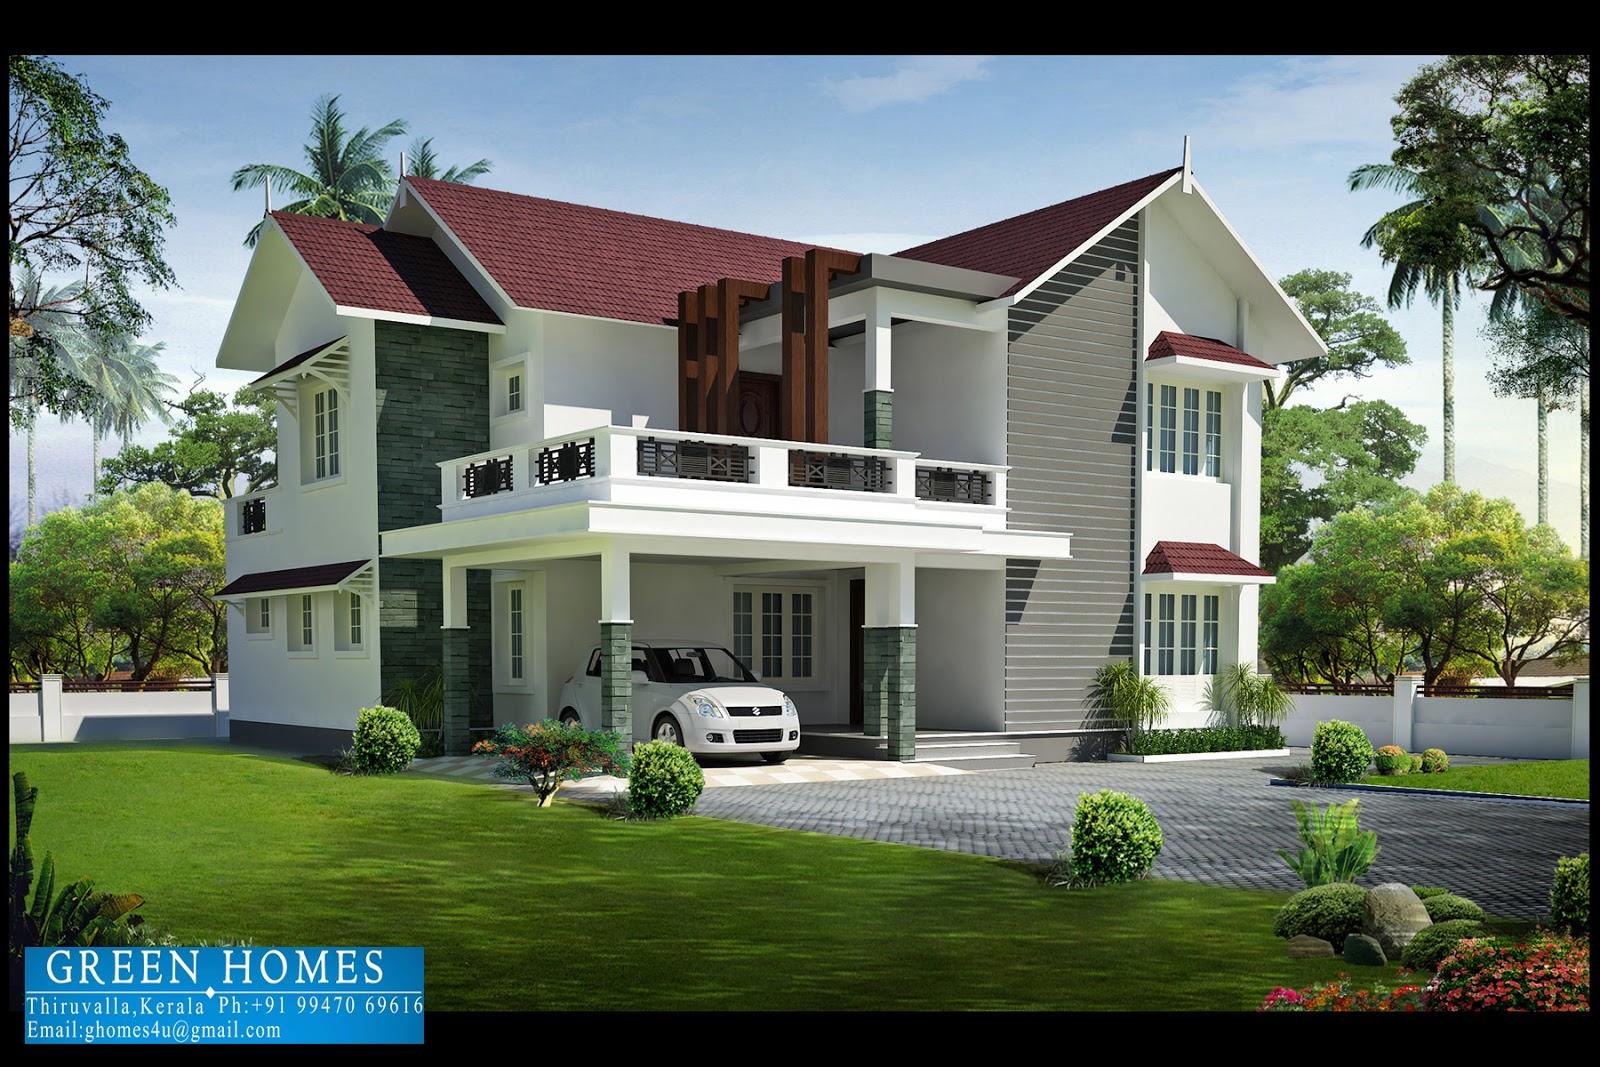 Green Homes: January 2013